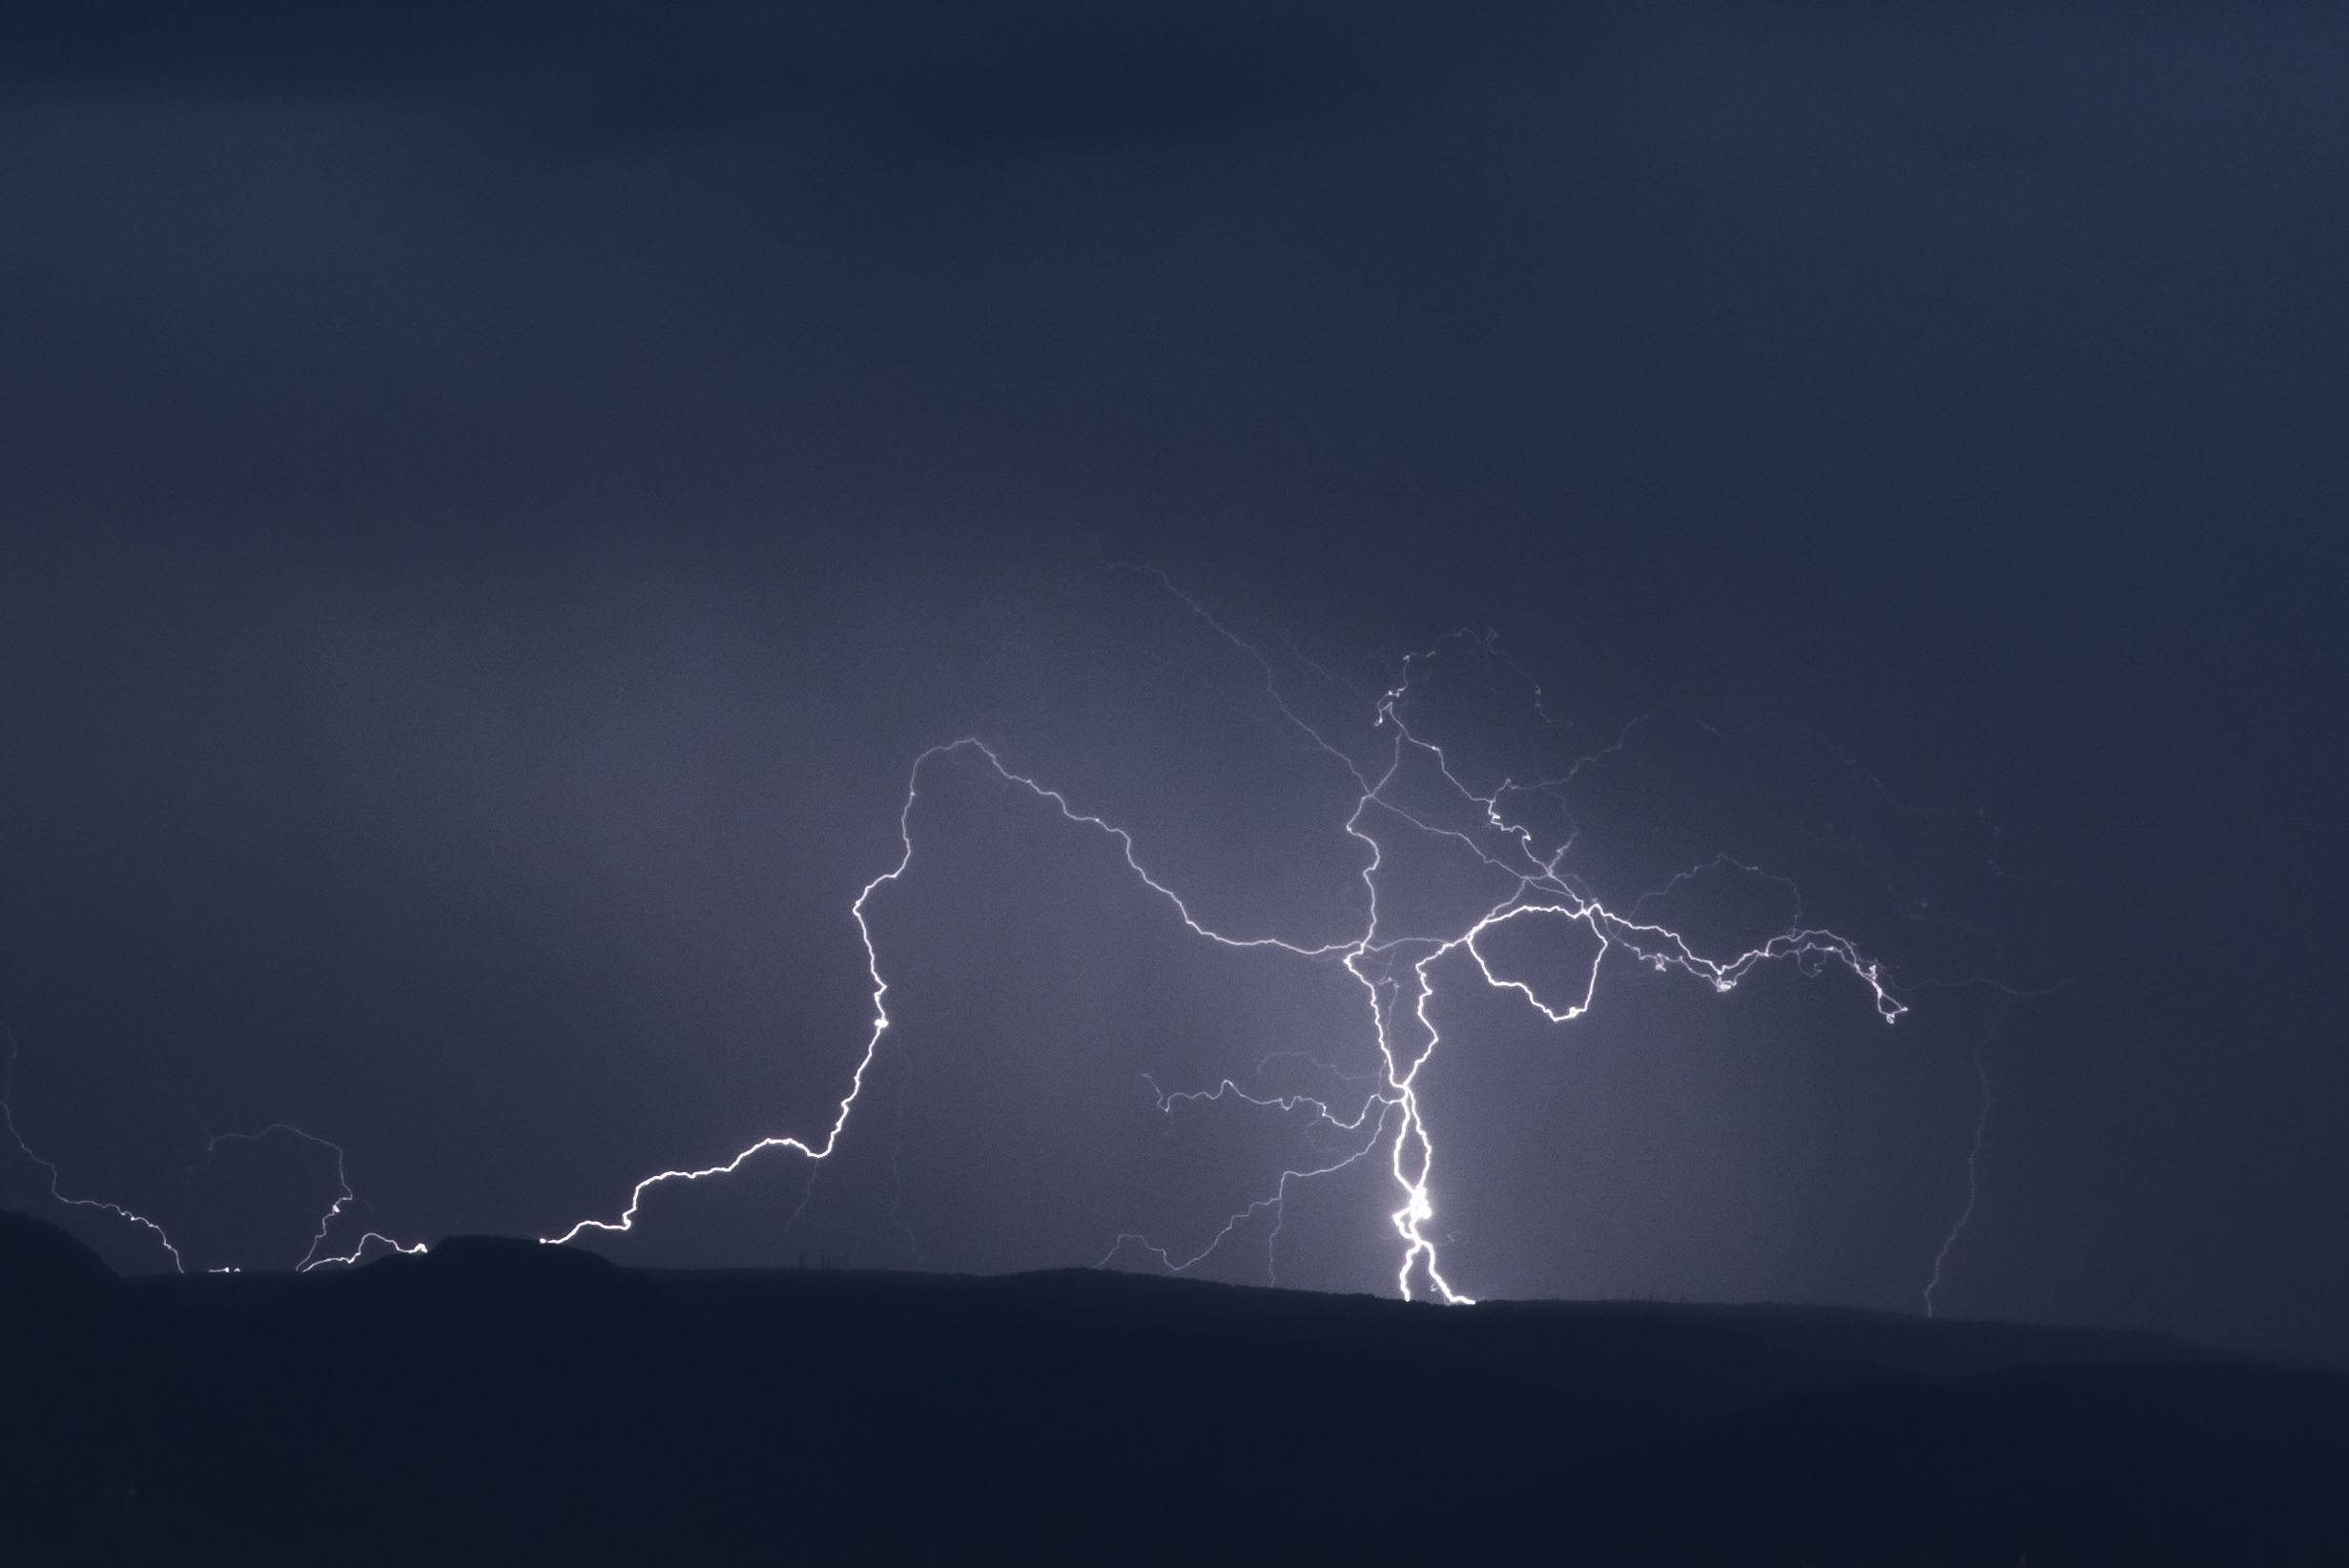 Photographing Lightning